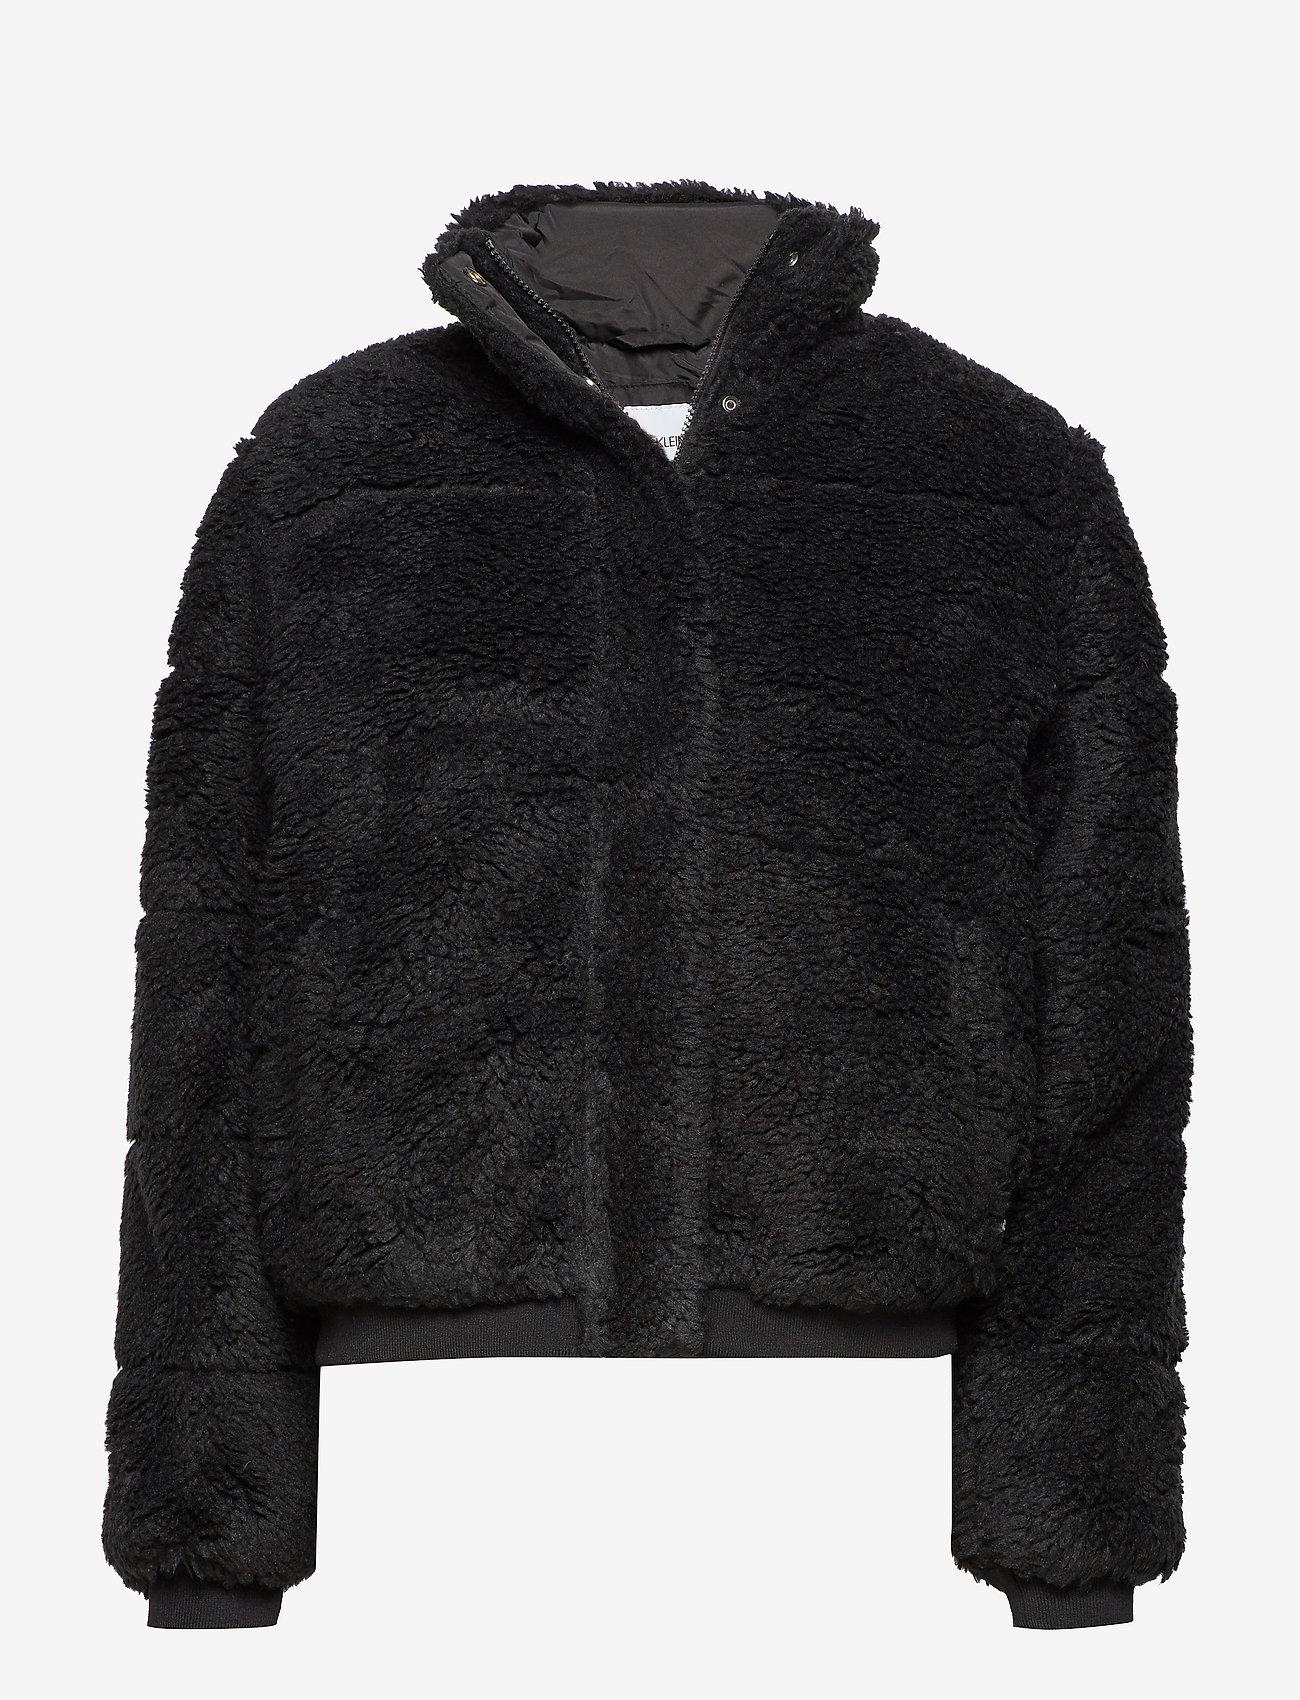 Calvin Klein Jeans - POLAR FLEECE PUFFER - fausse fourrure - ck black